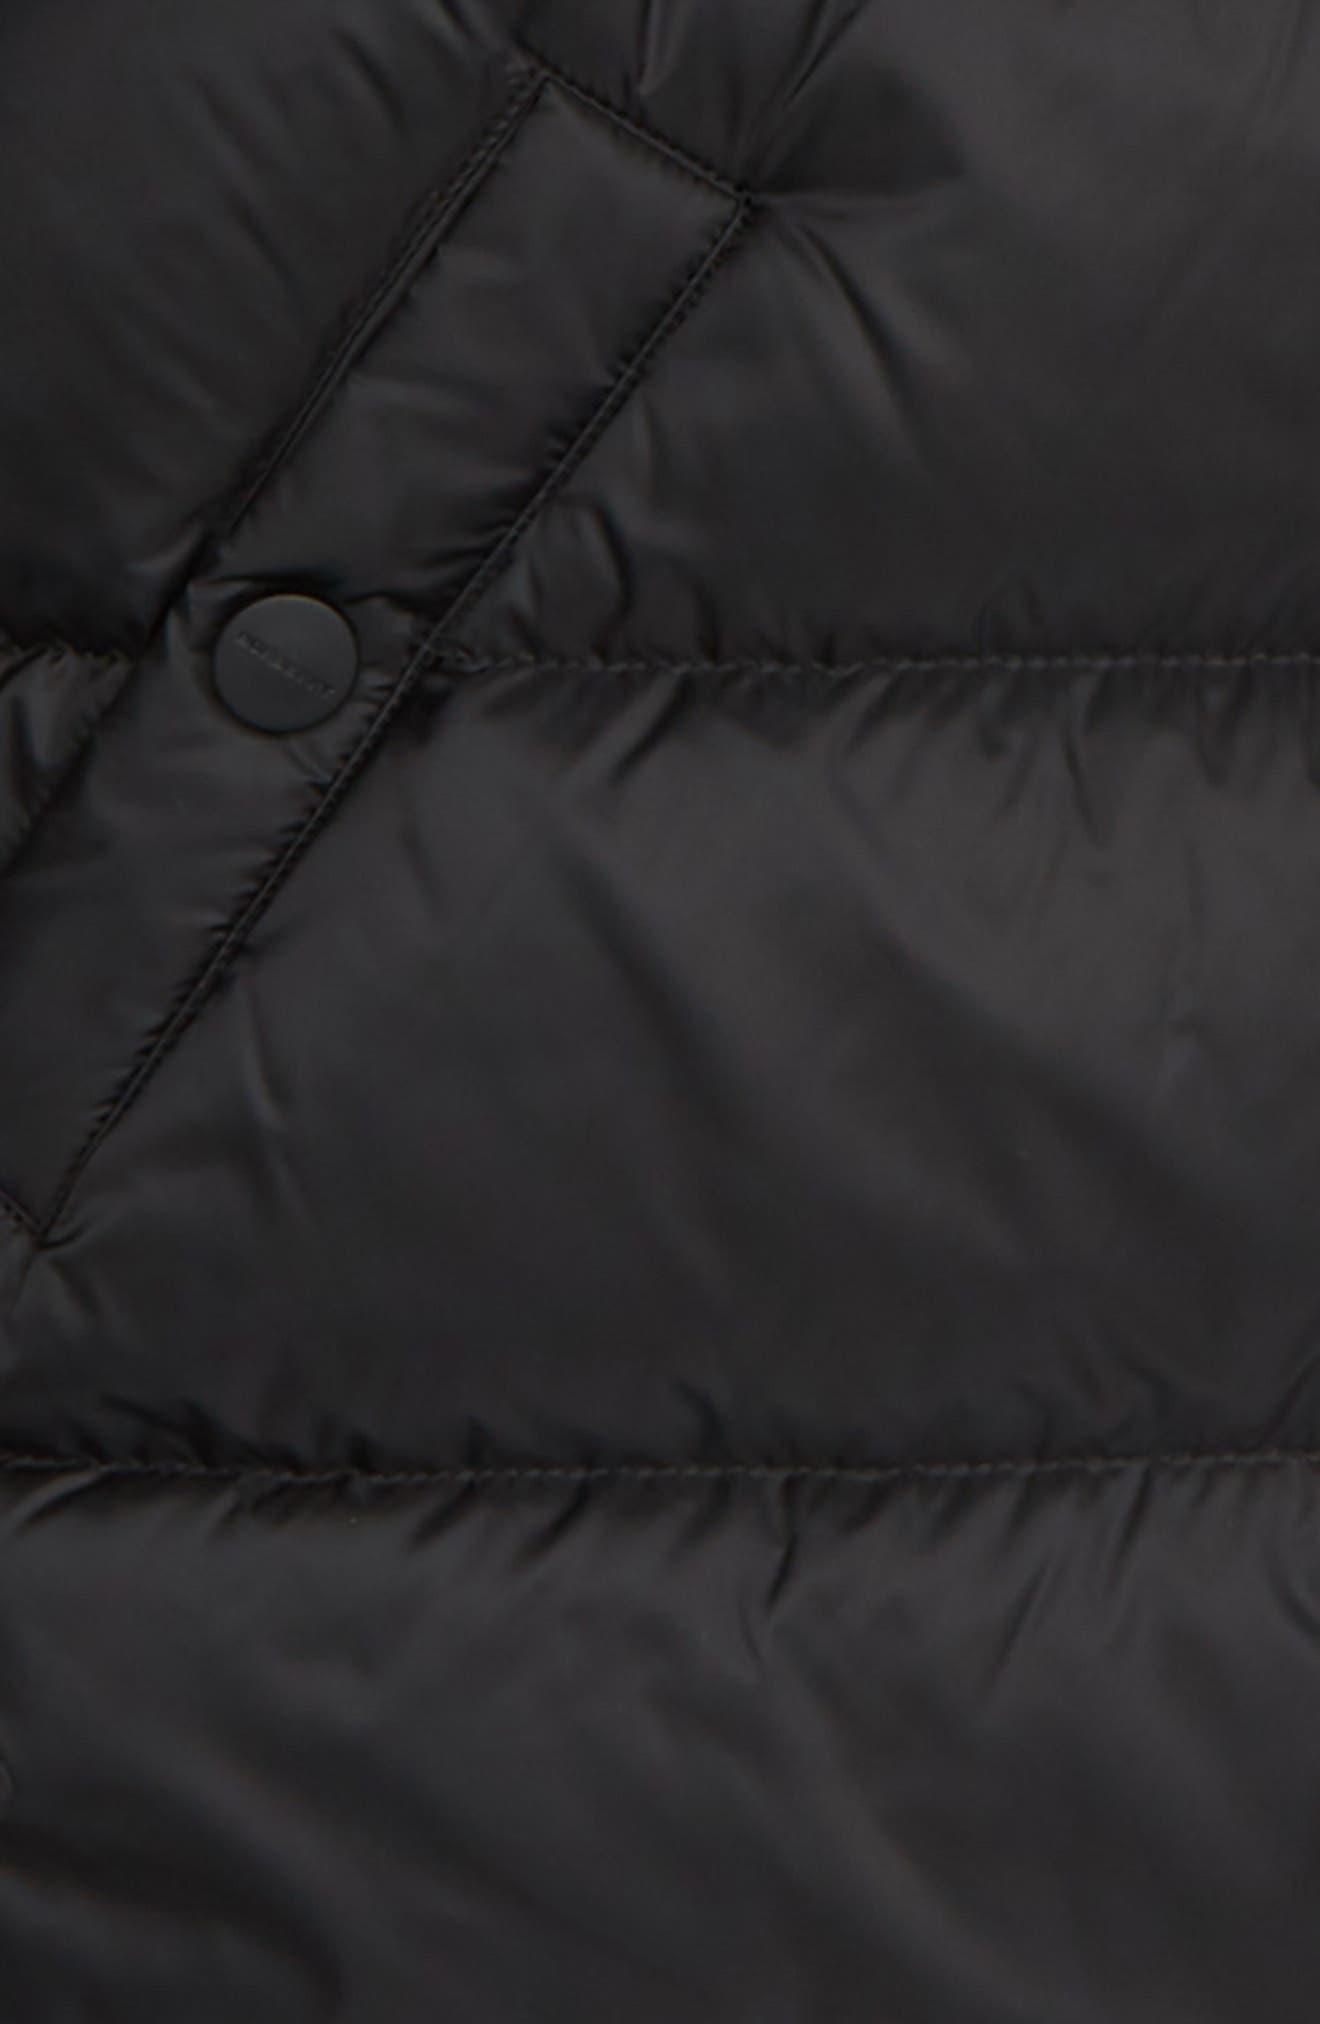 BURBERRY, Waterproof Down Puffer Coat, Alternate thumbnail 2, color, 001